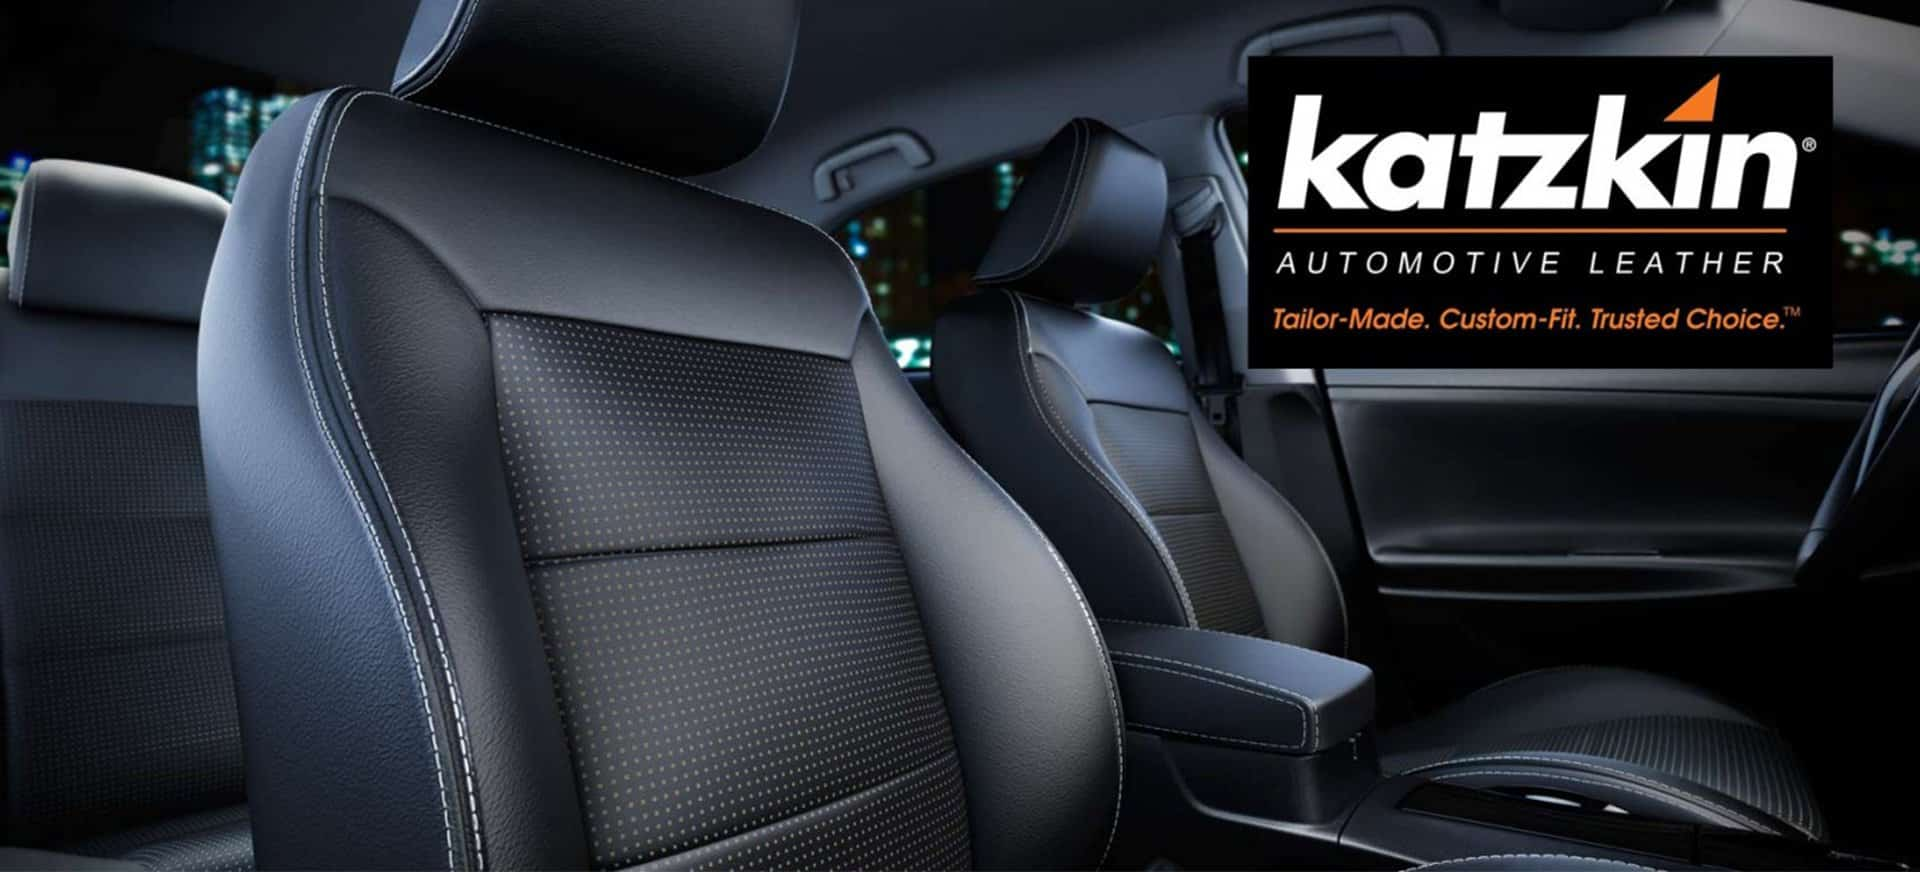 katzkin-ottawa ottawa-auto-leather ottawa-automotive-upholstery